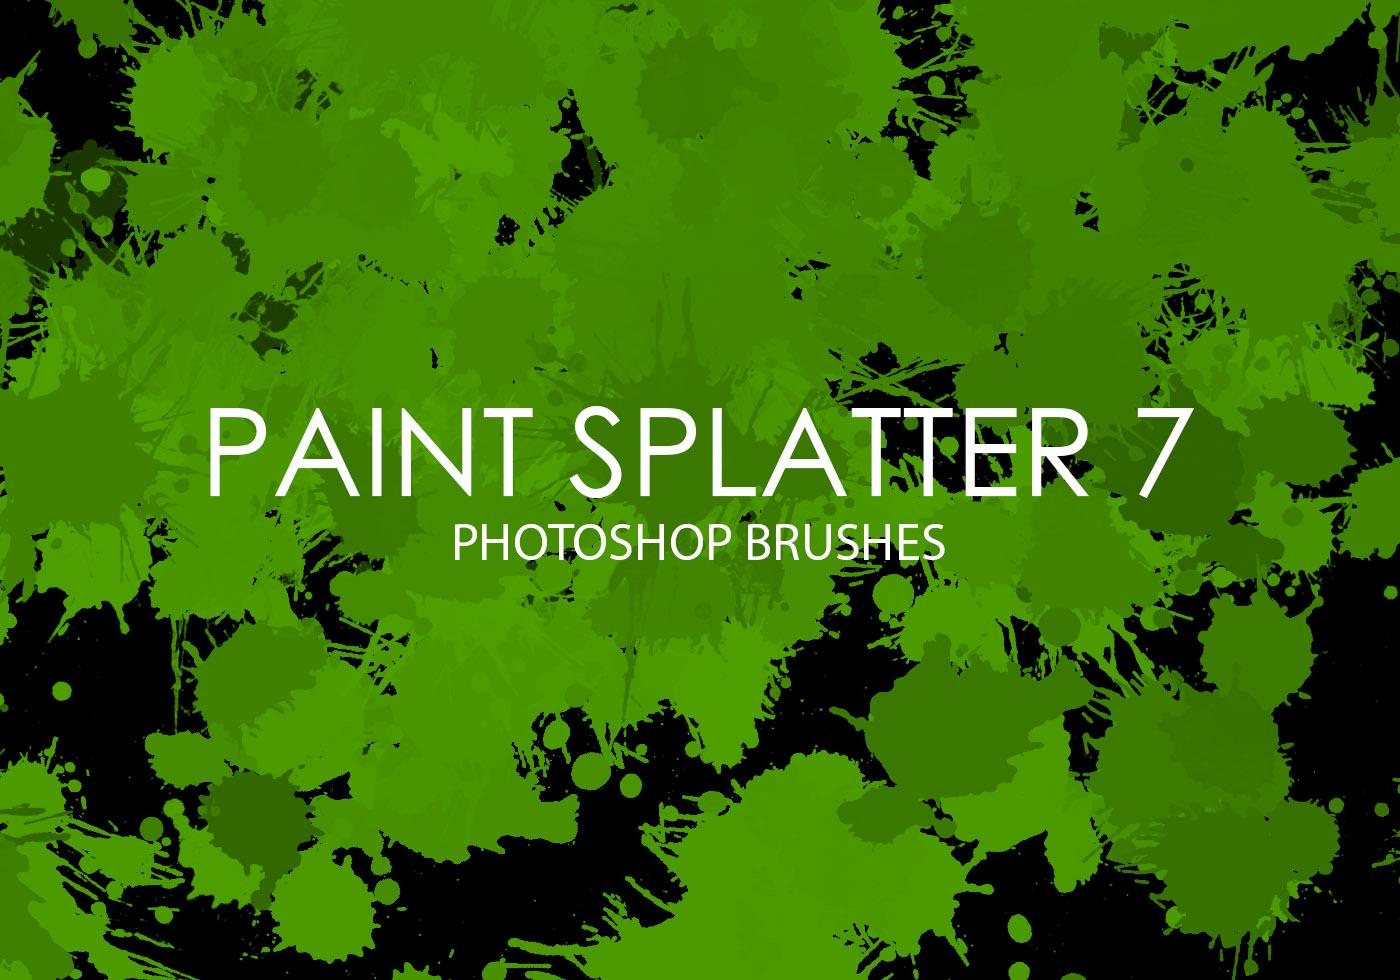 Paint Splatter Brush Photoshop Best Of Free Paint Splatter Shop Brushes 7 Free Shop